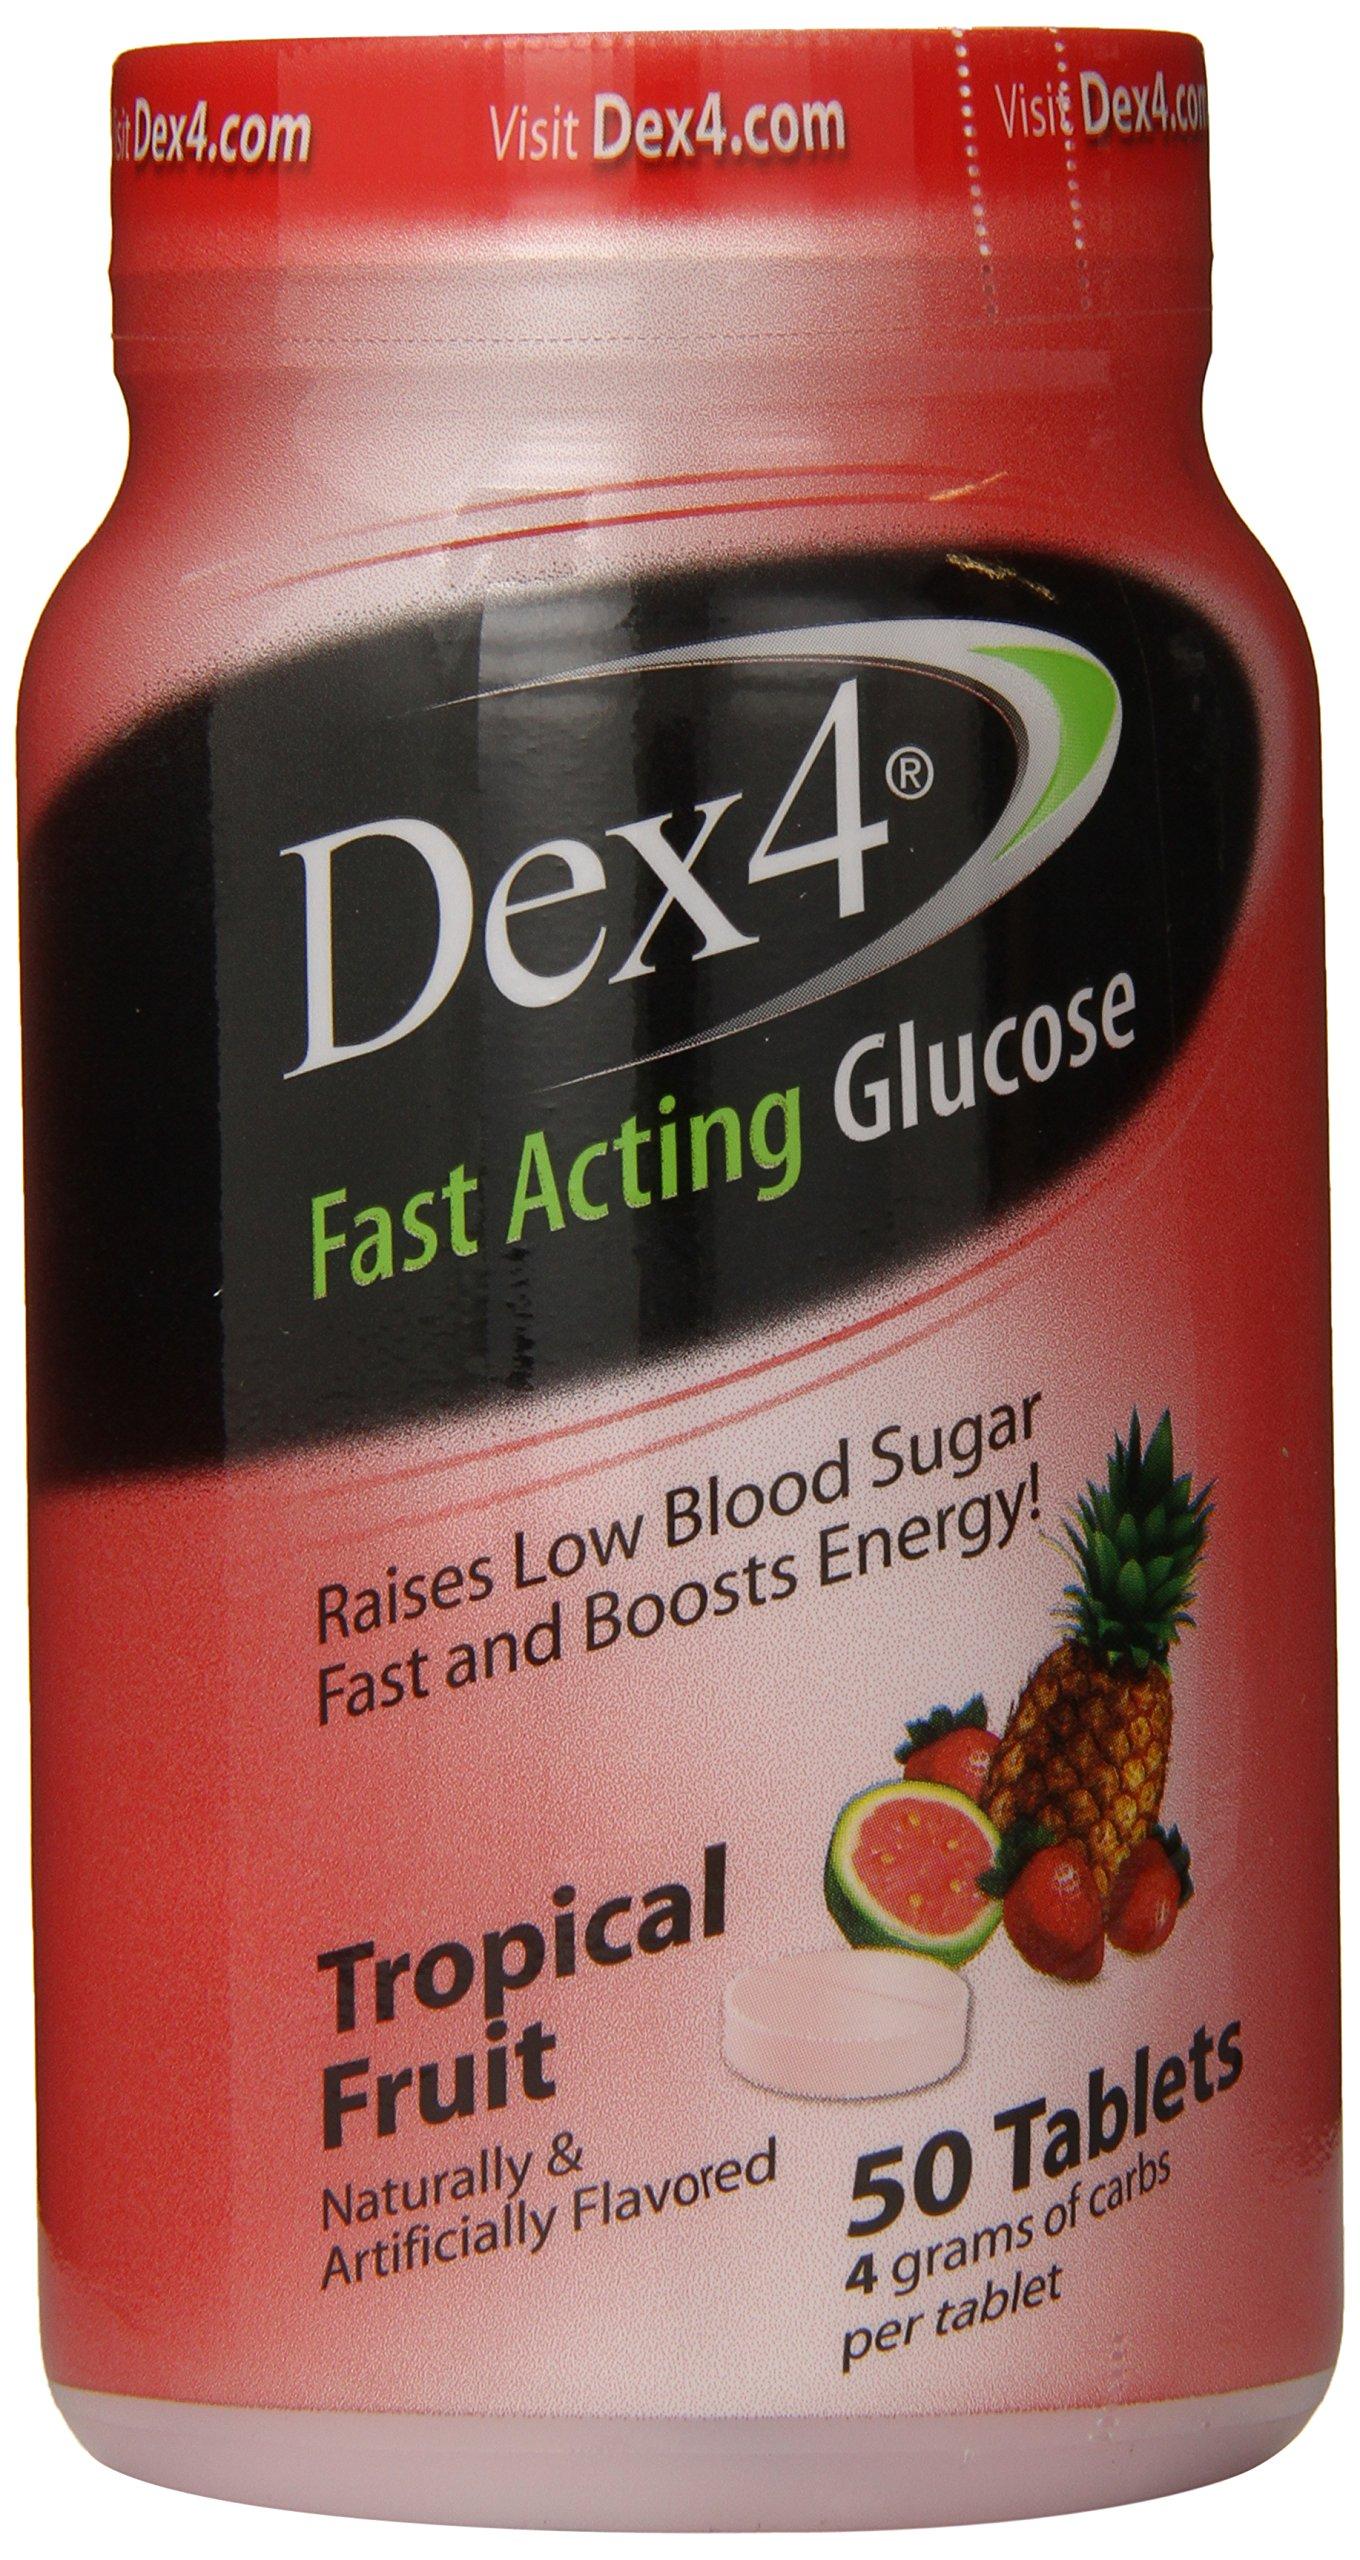 Dex4 Glucose Tablets, Tropical Fruit, 50 Count